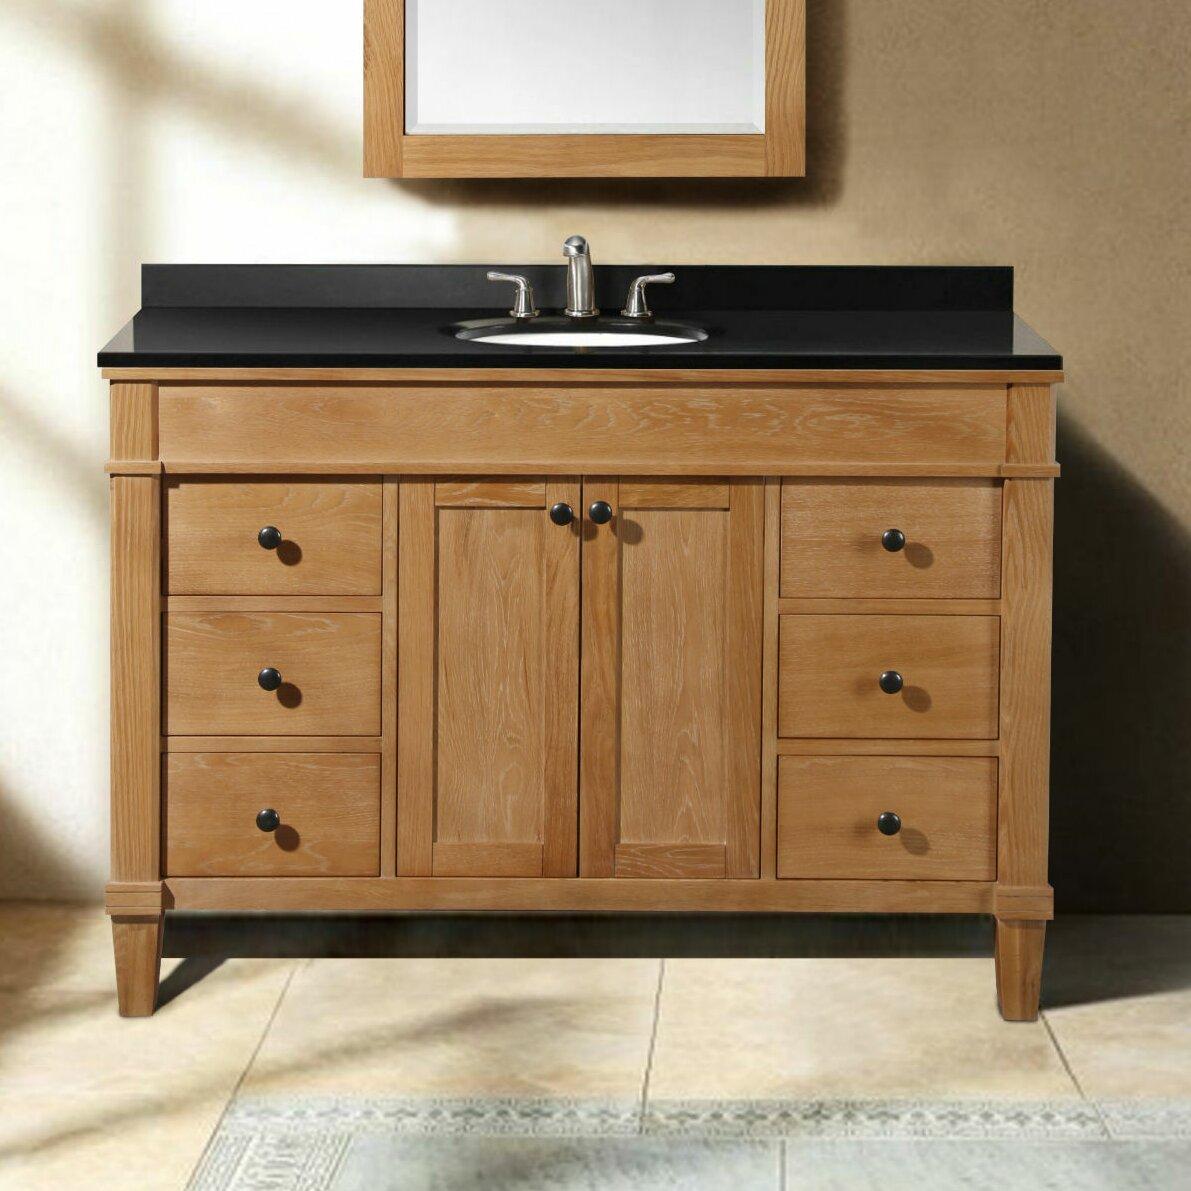 Legion furniture 49 single bathroom vanity set reviews for Bathroom furniture sets